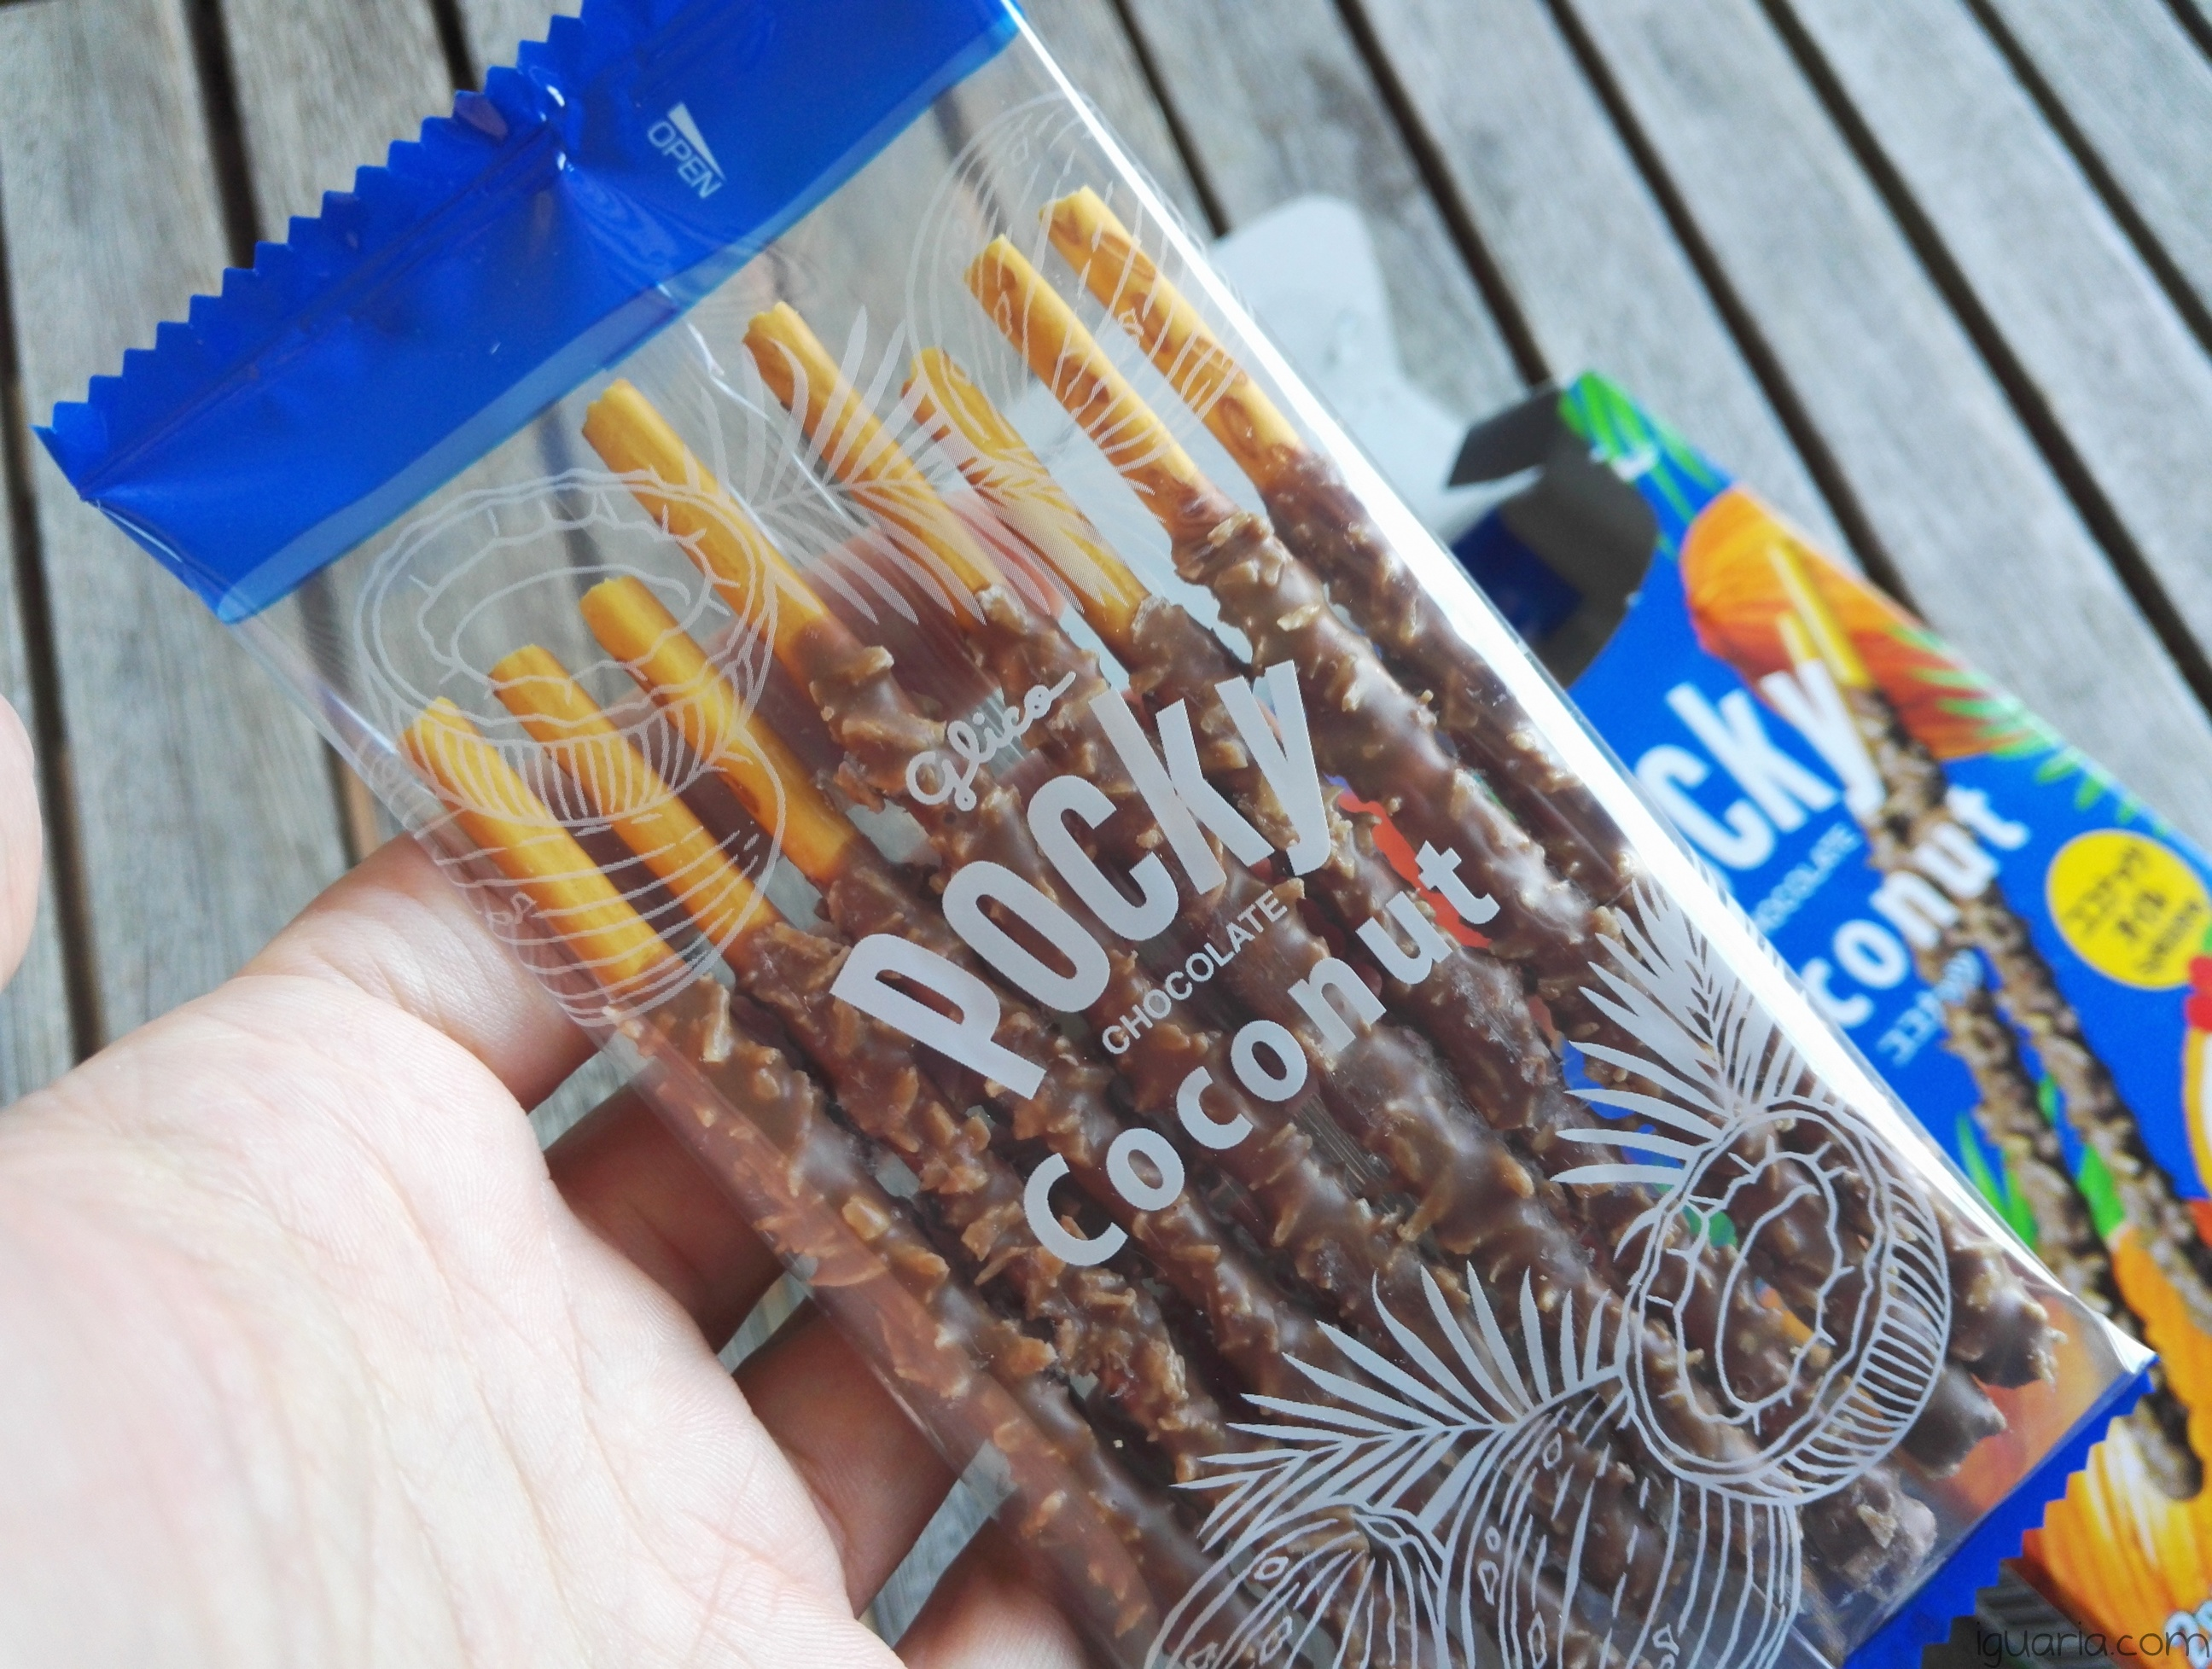 iguaria-pacote-pocky-coco